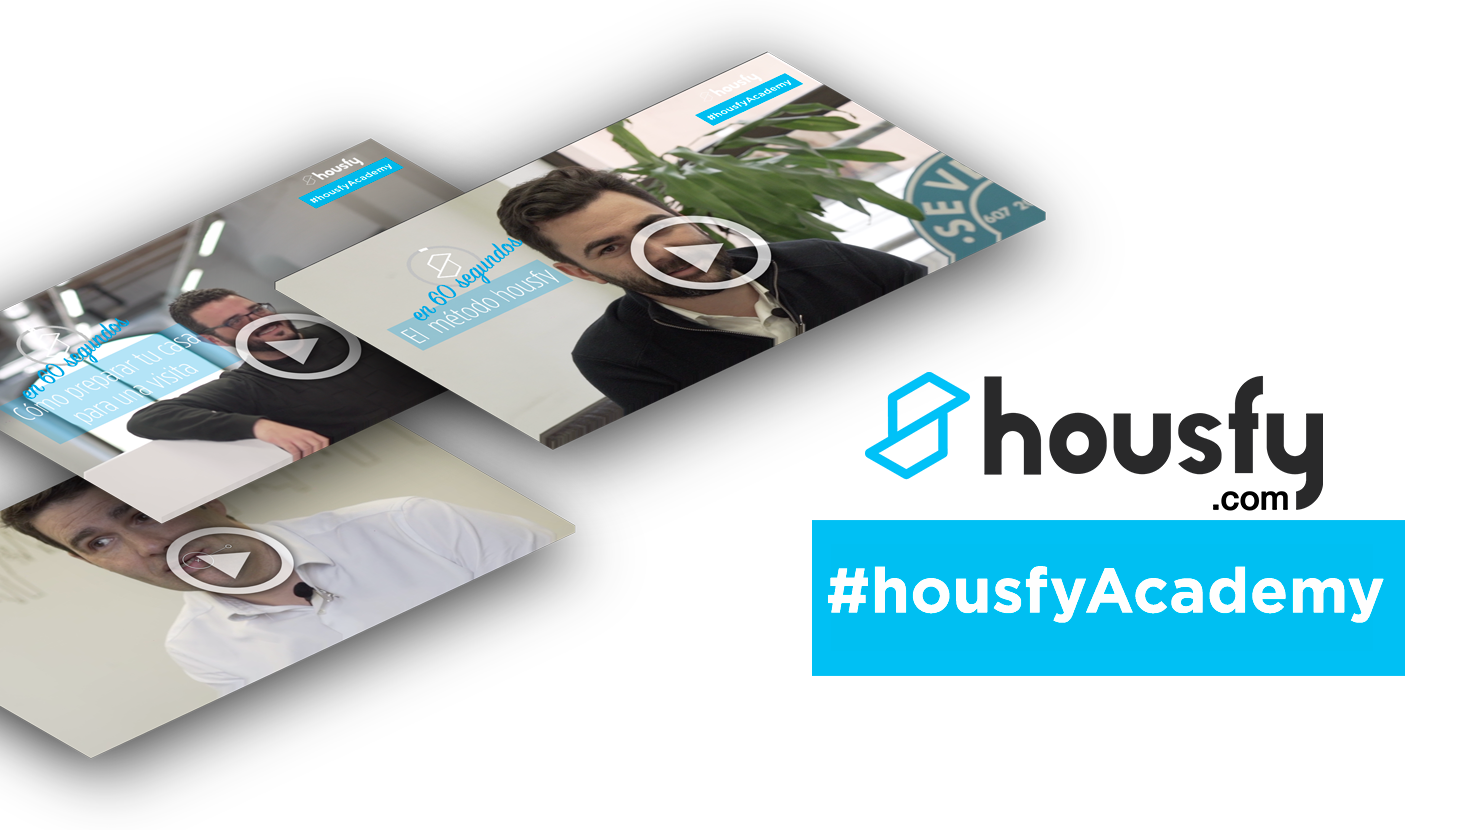 Housfy Academy